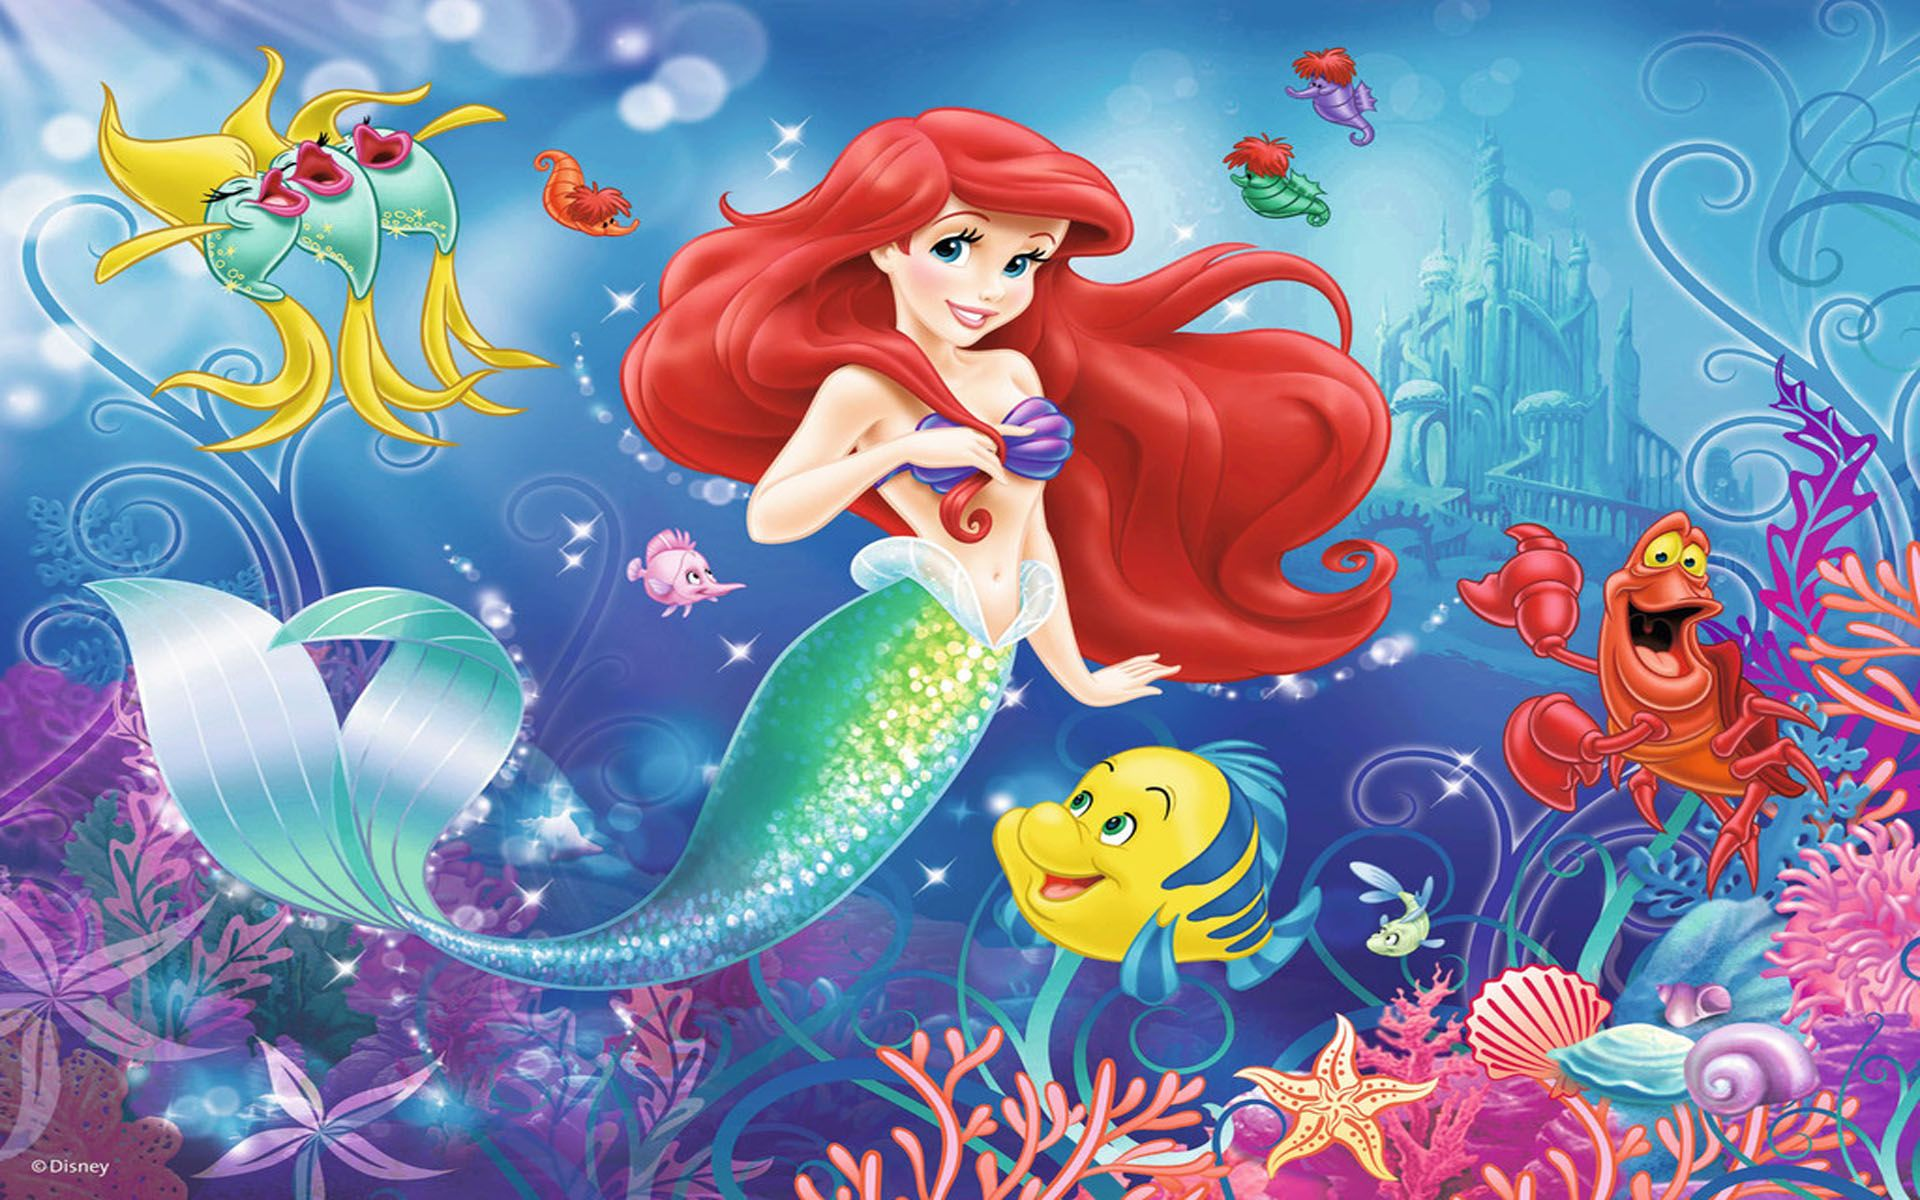 Download Cartoon Disney Princess Ariel The Little Mermaid Fish Flounder Sebastian The Crab Pu Little Mermaid Wallpaper Mermaid Wallpapers Disney Princess Ariel